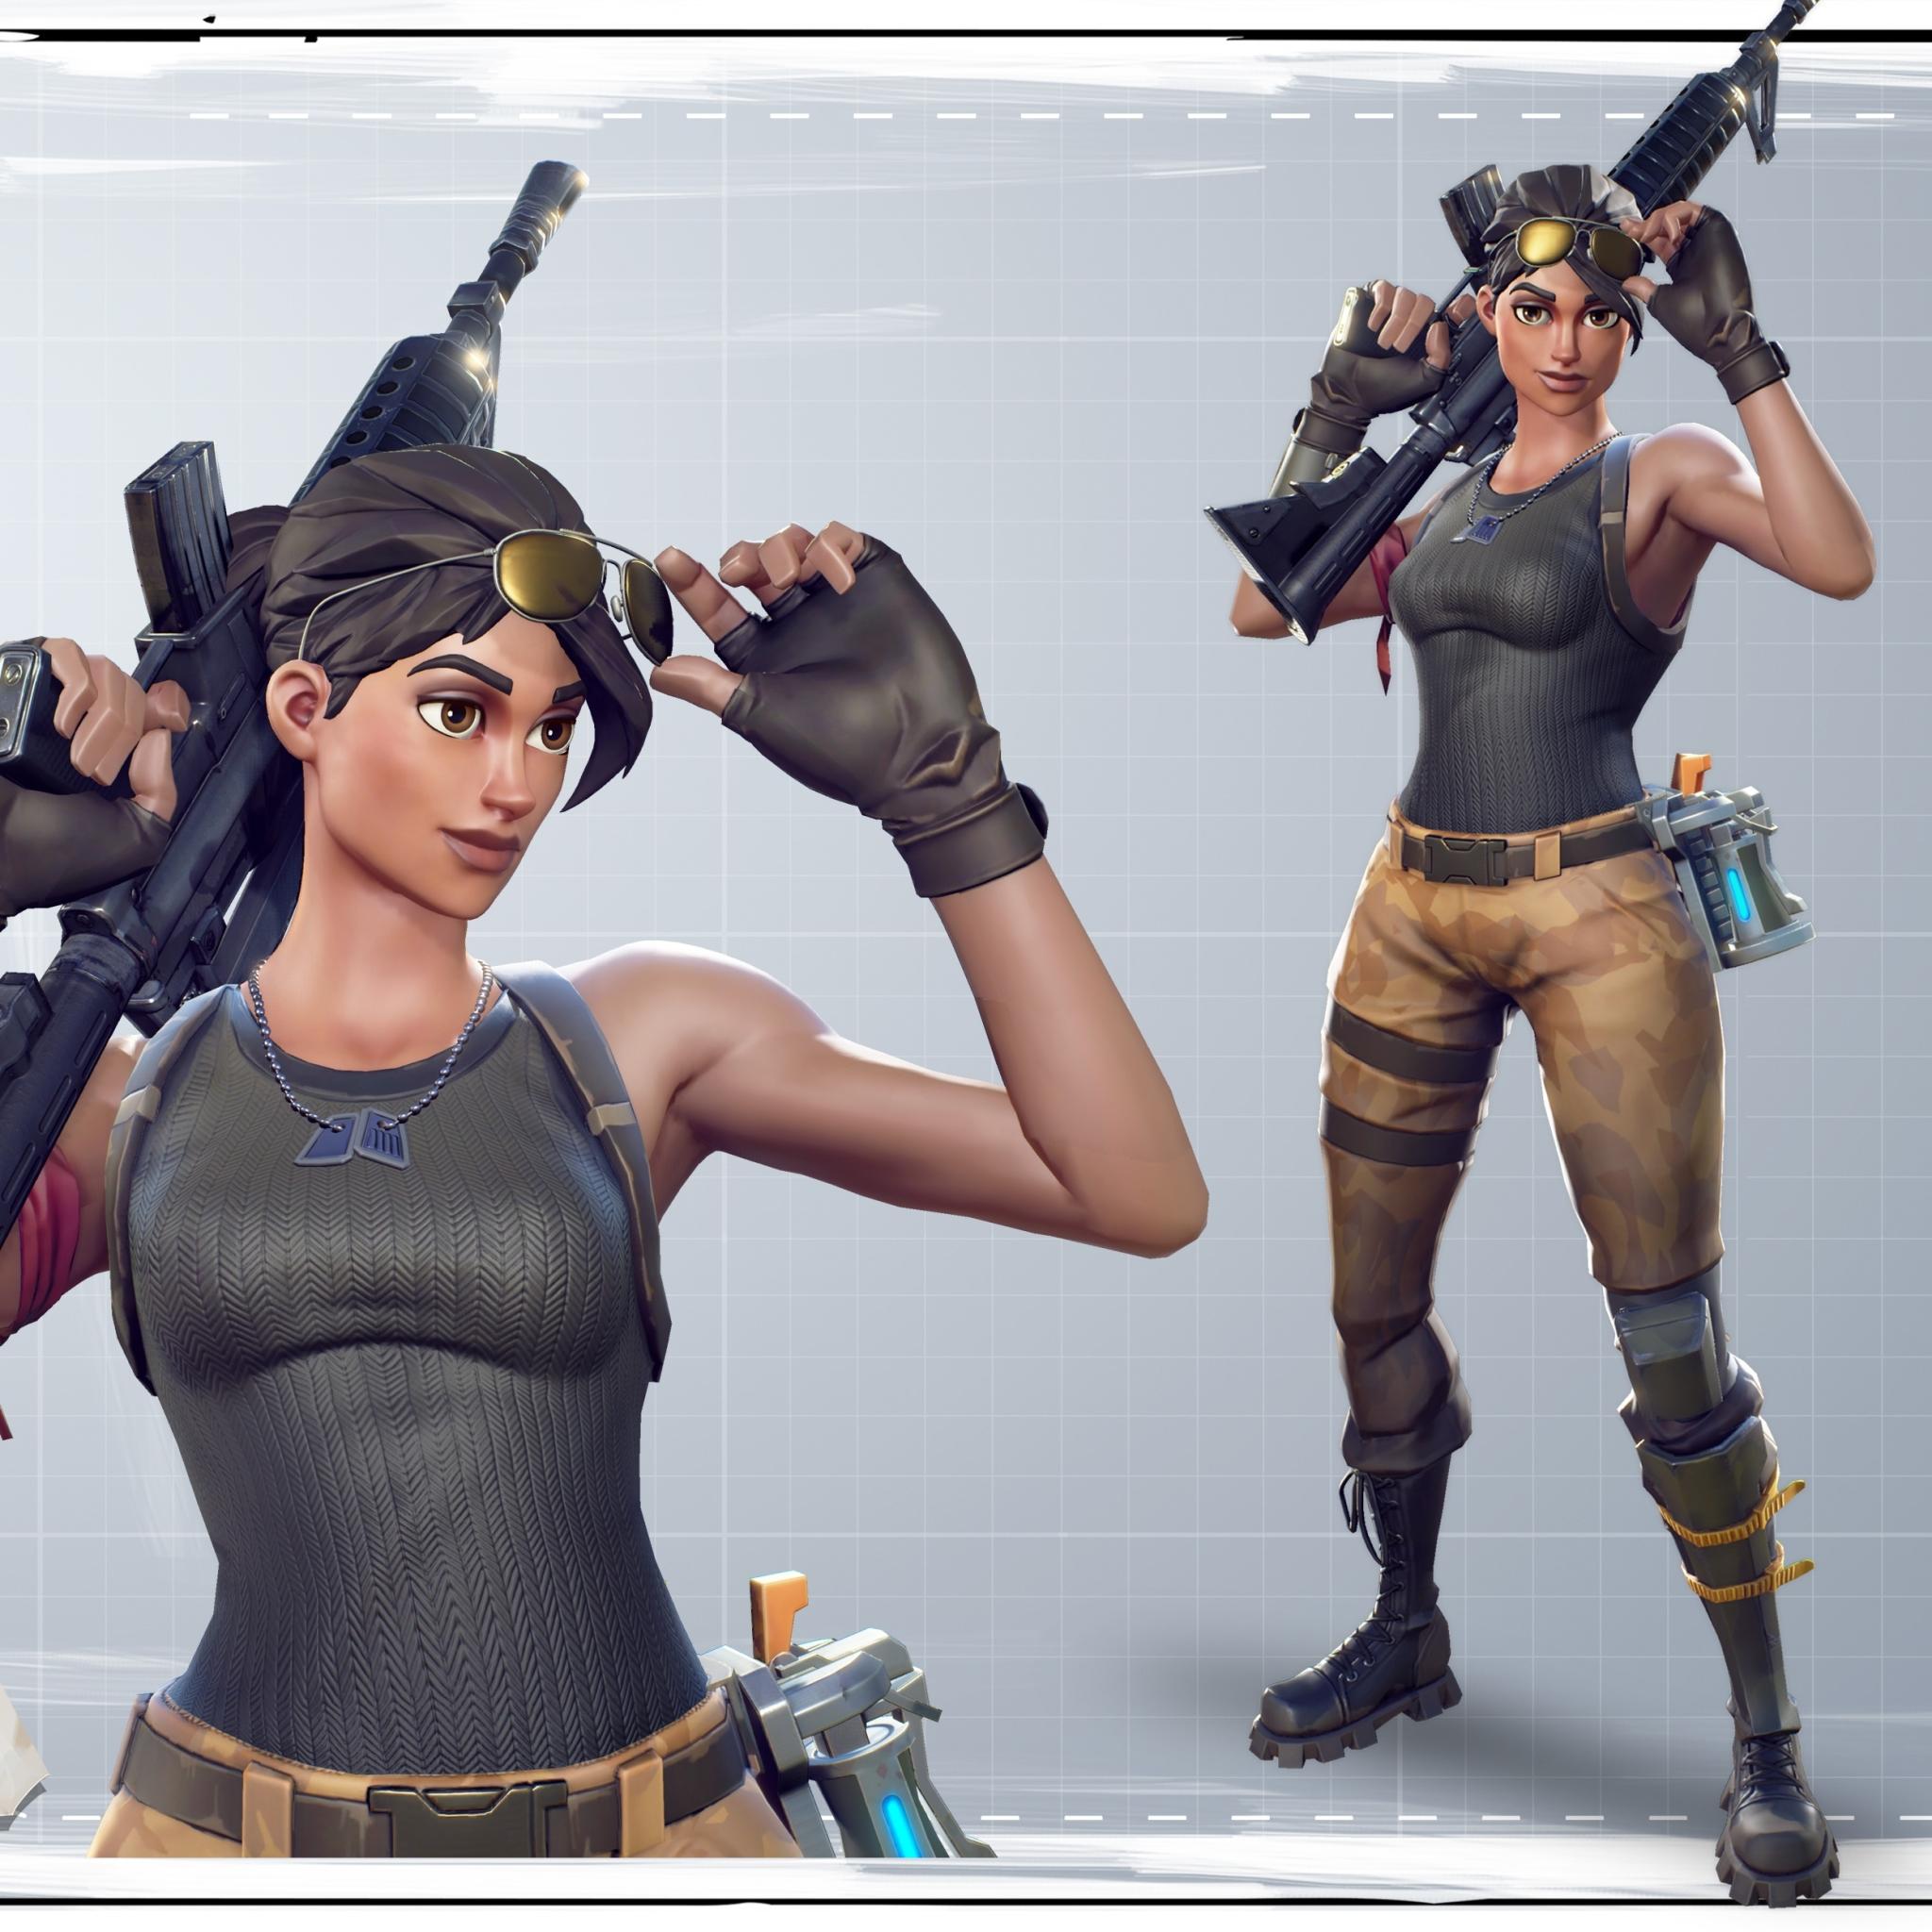 how to change avatars in fortnite